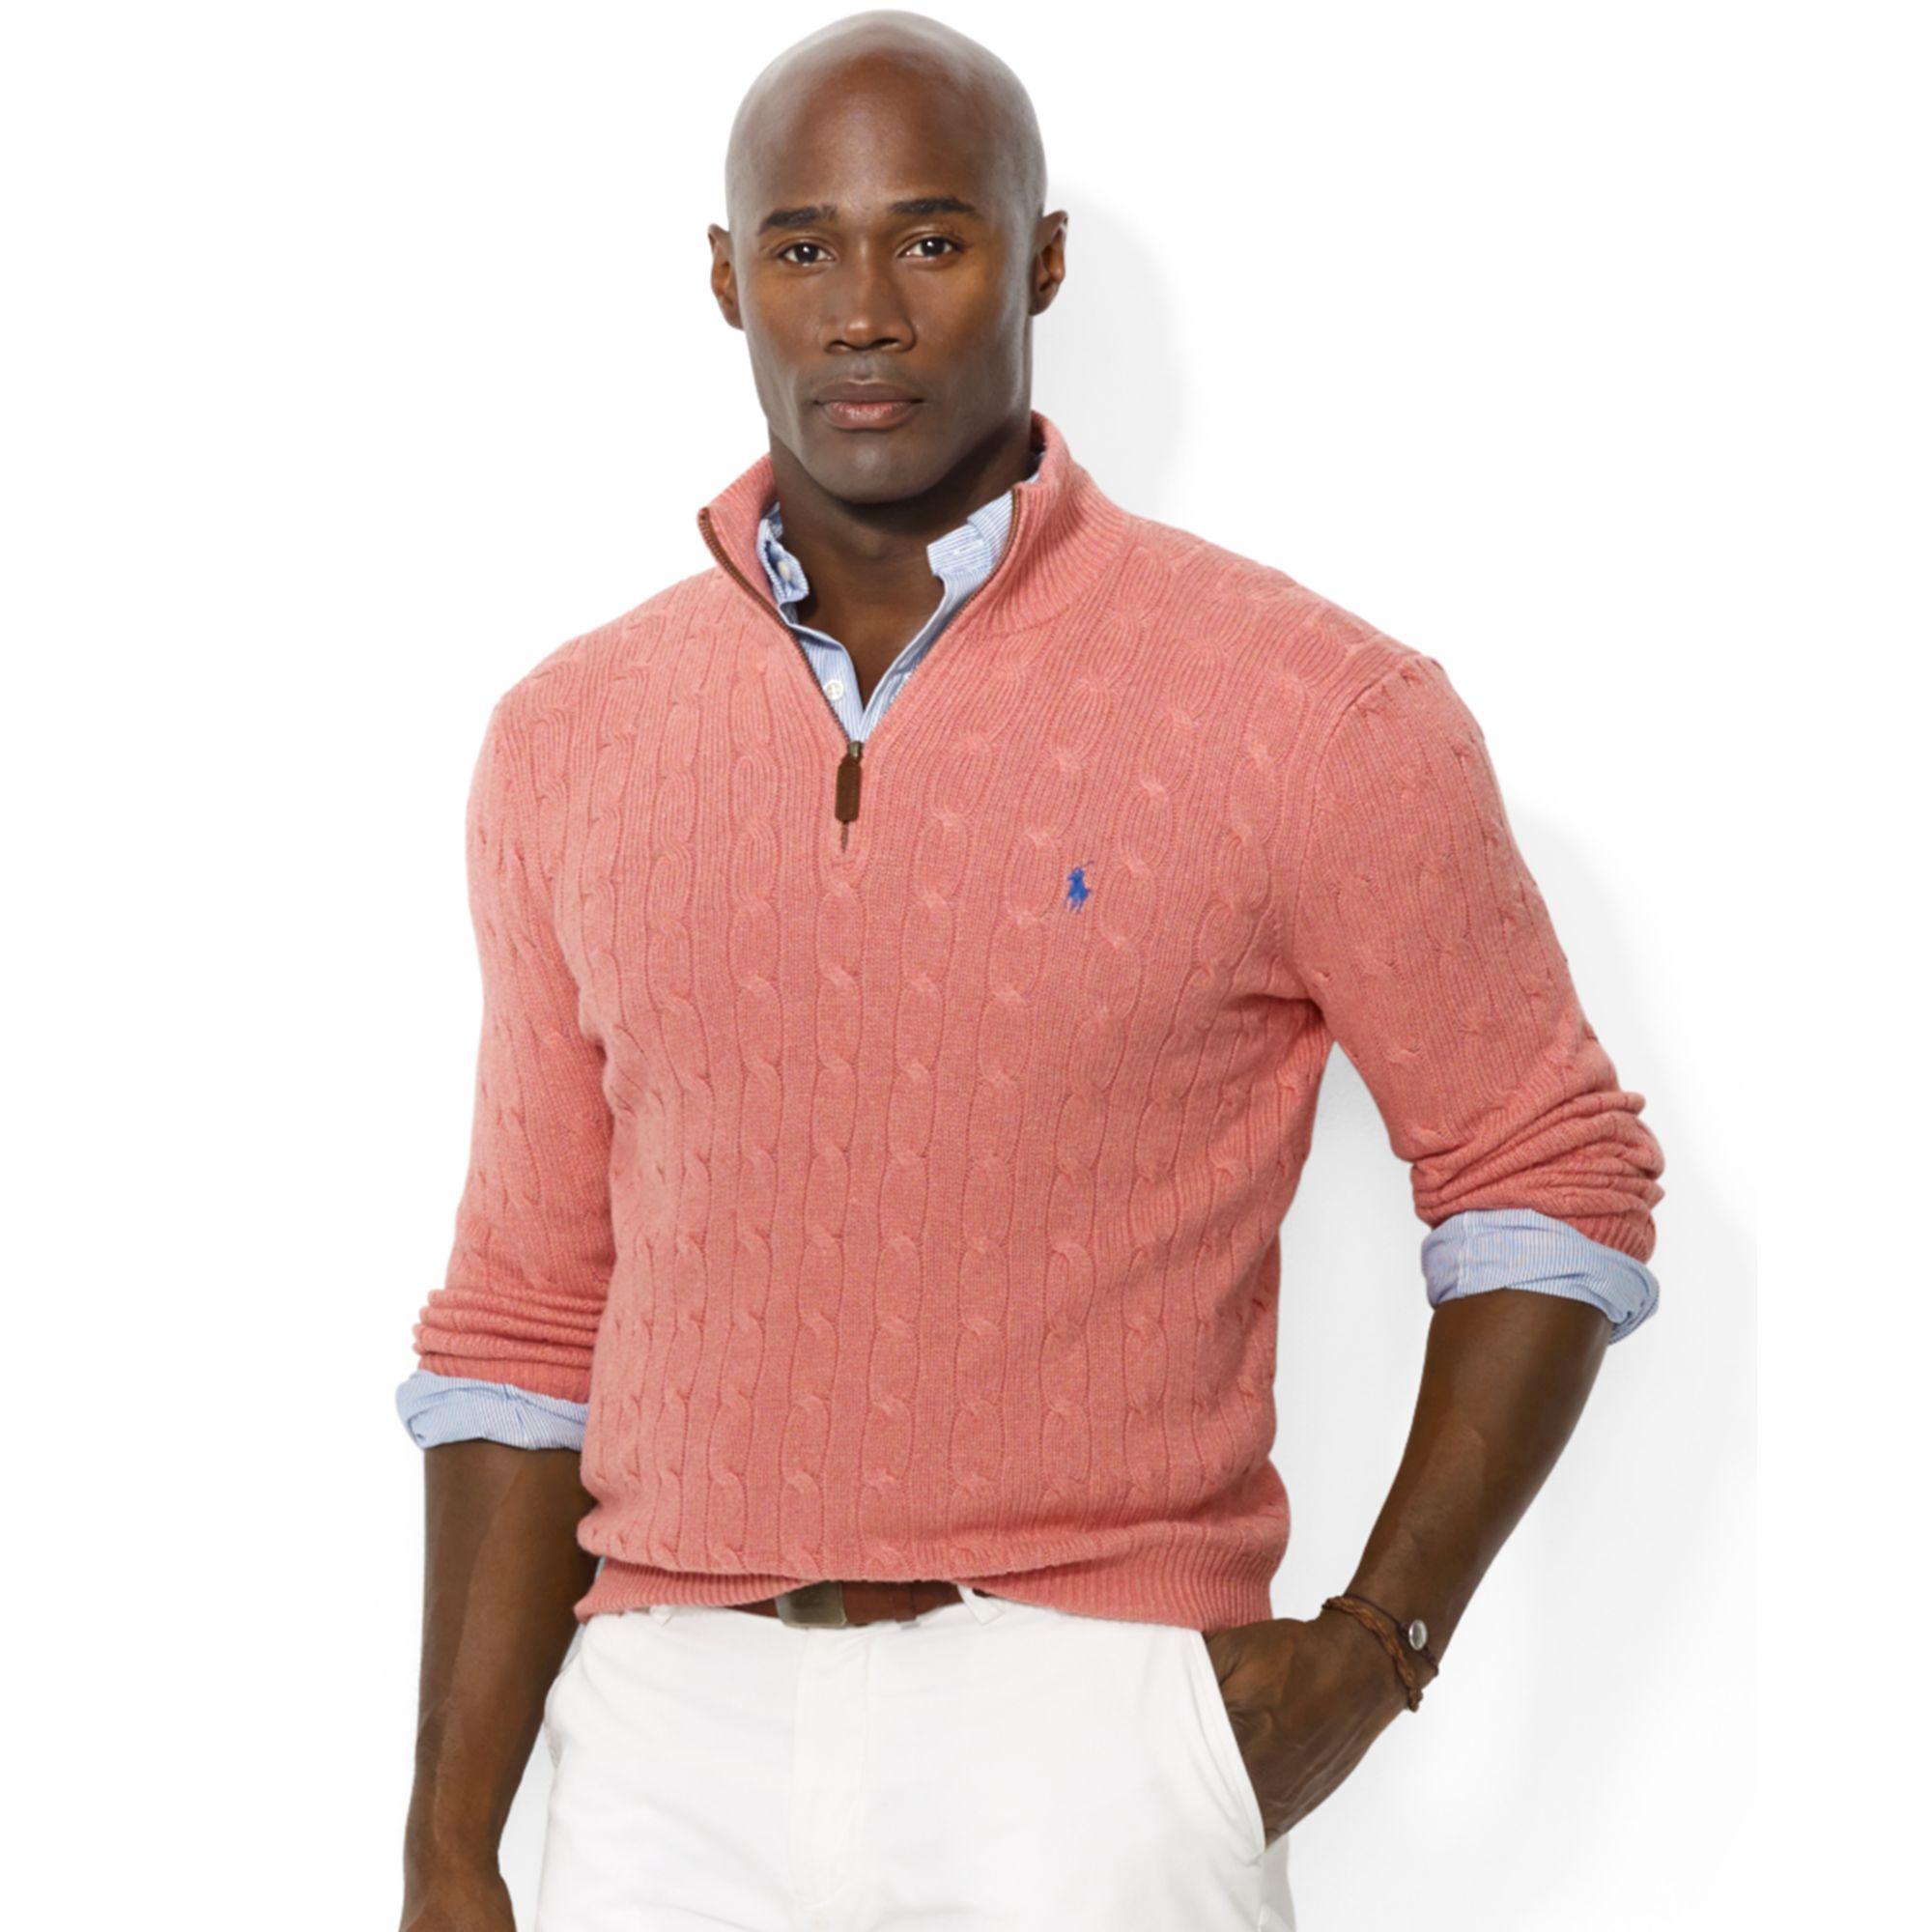 Ralph lauren Half Zip Cable Knit Tussah Silk Sweater in Pink for ...